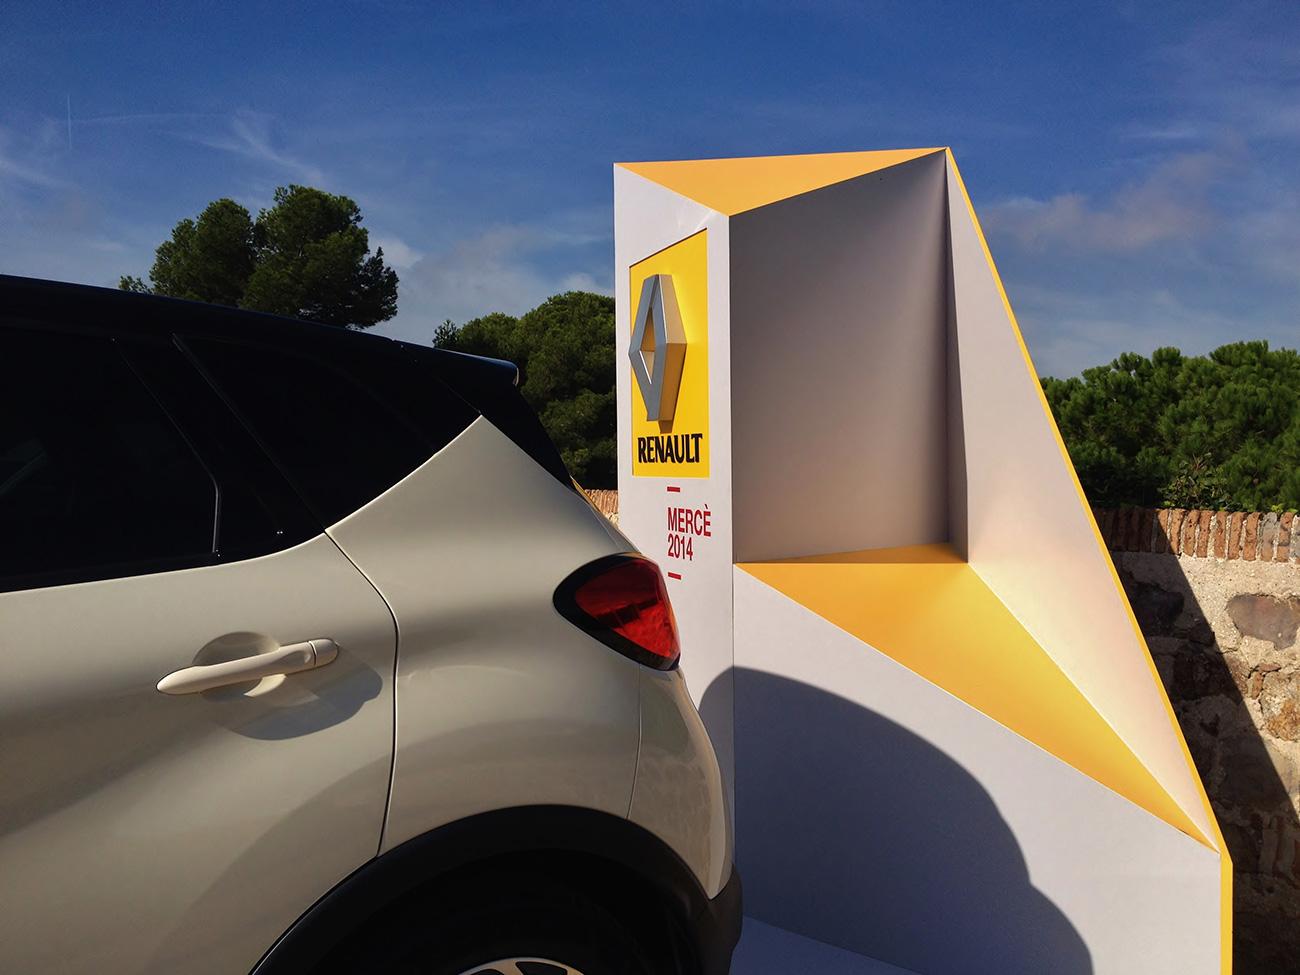 Espacios exteriores Renault